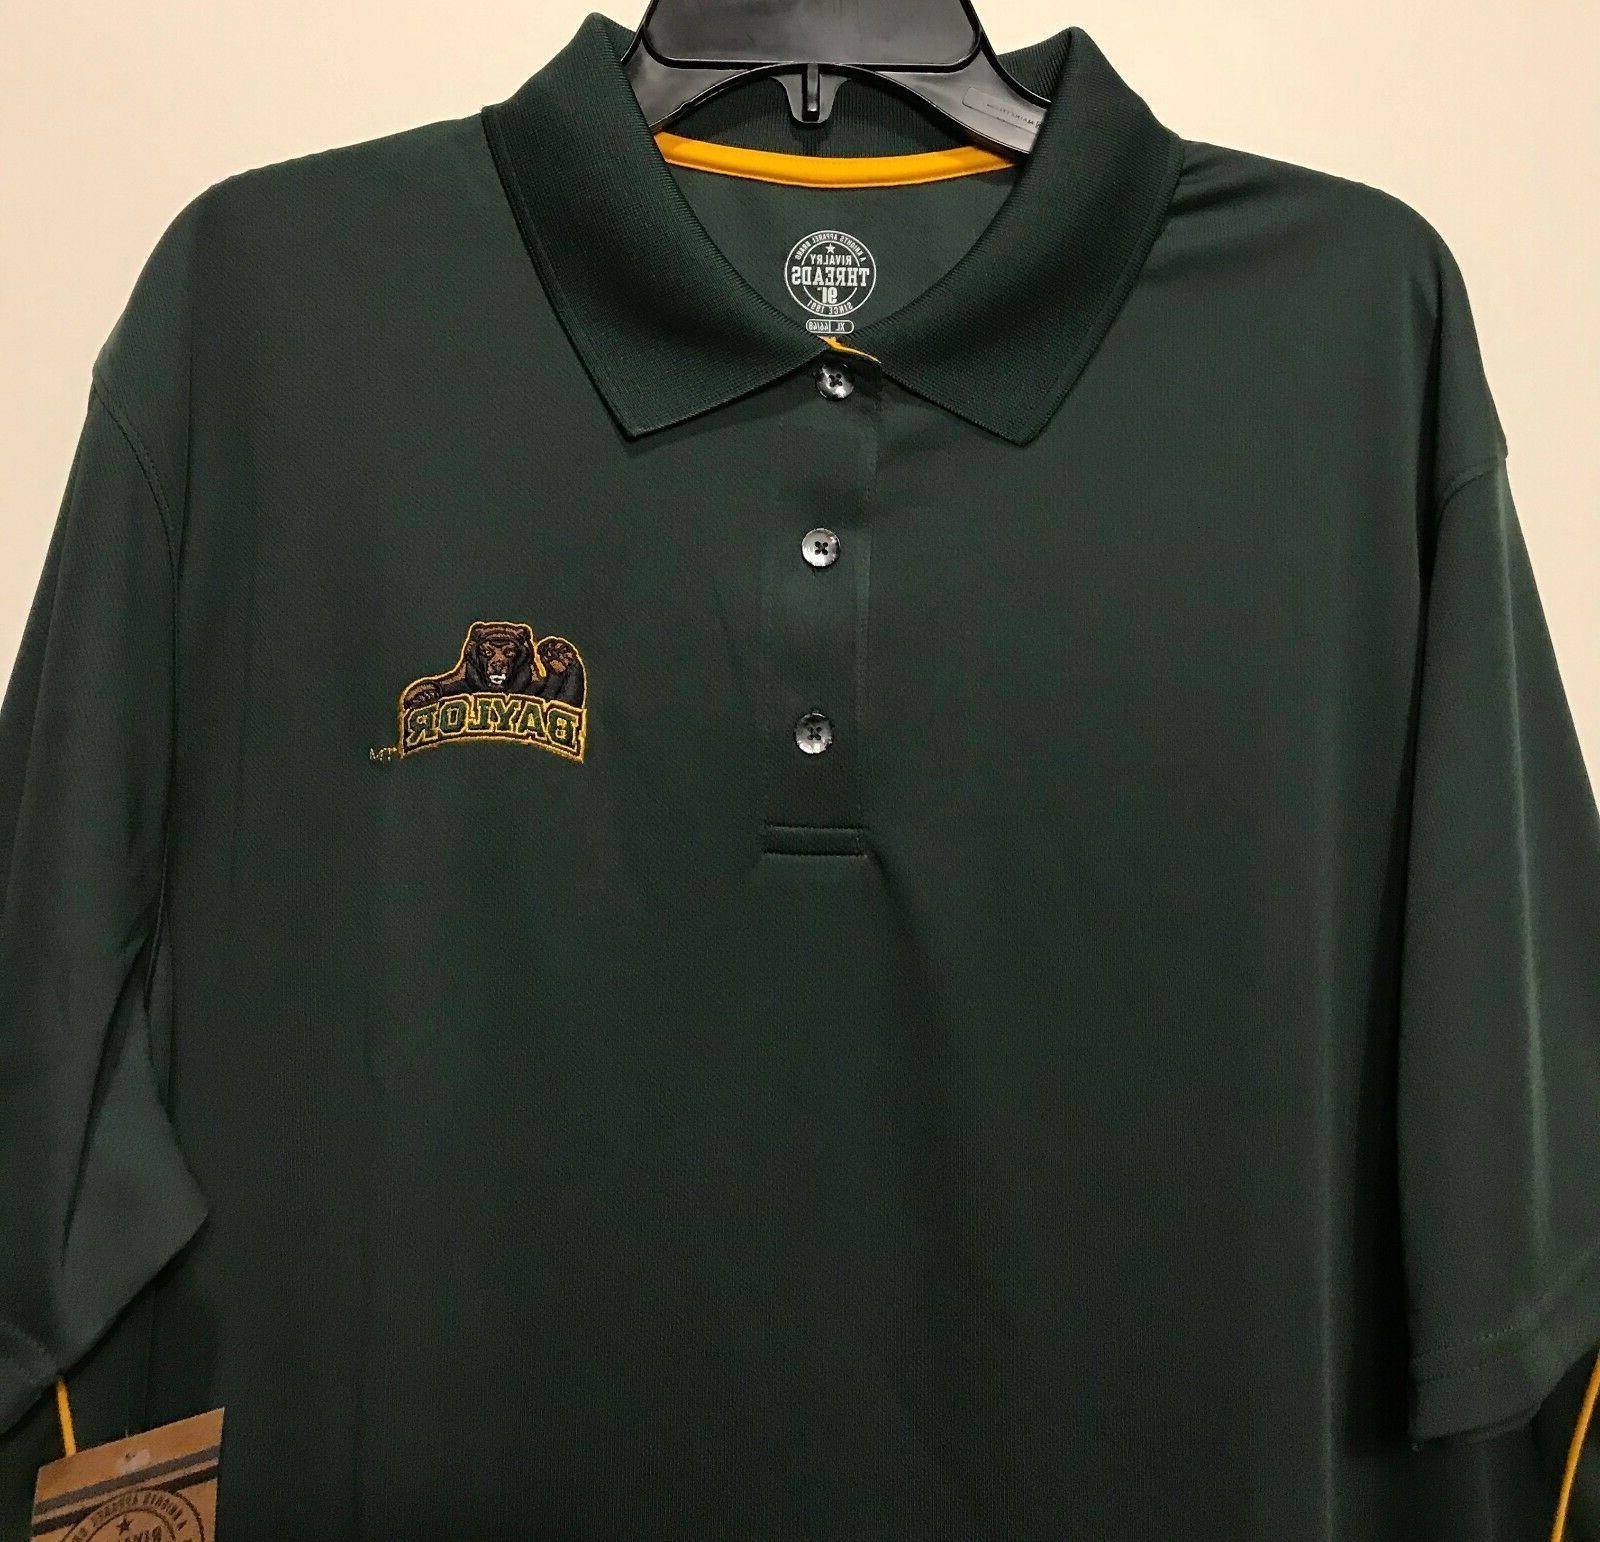 New $30 Bears Shirt Logo